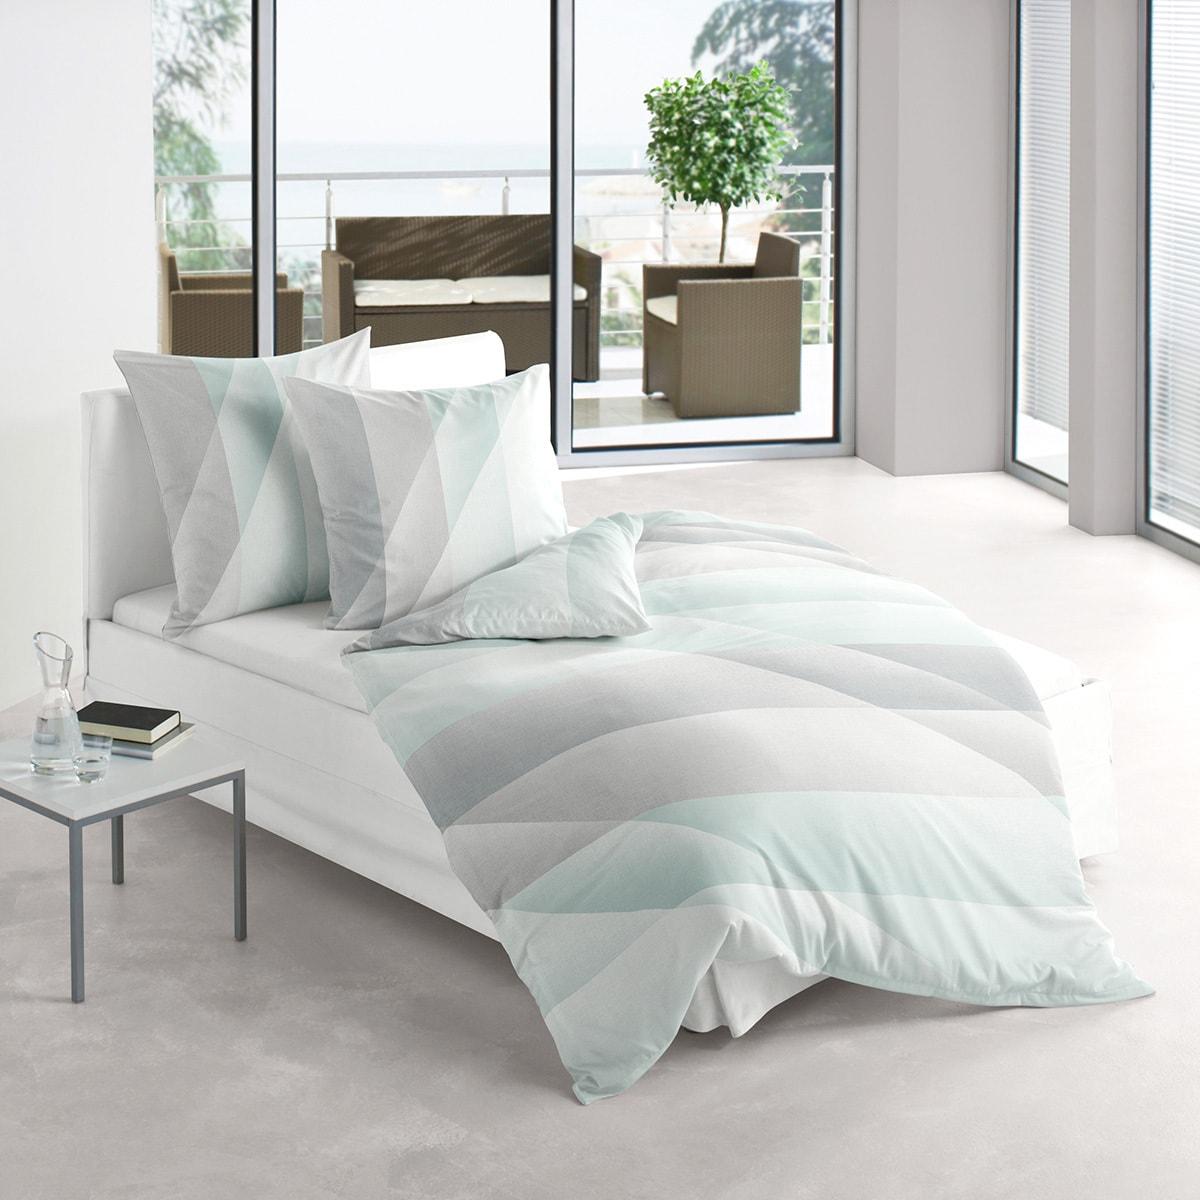 irisette mako satin bettw sche capri 8683 30 g nstig online kaufen bei bettwaren shop. Black Bedroom Furniture Sets. Home Design Ideas